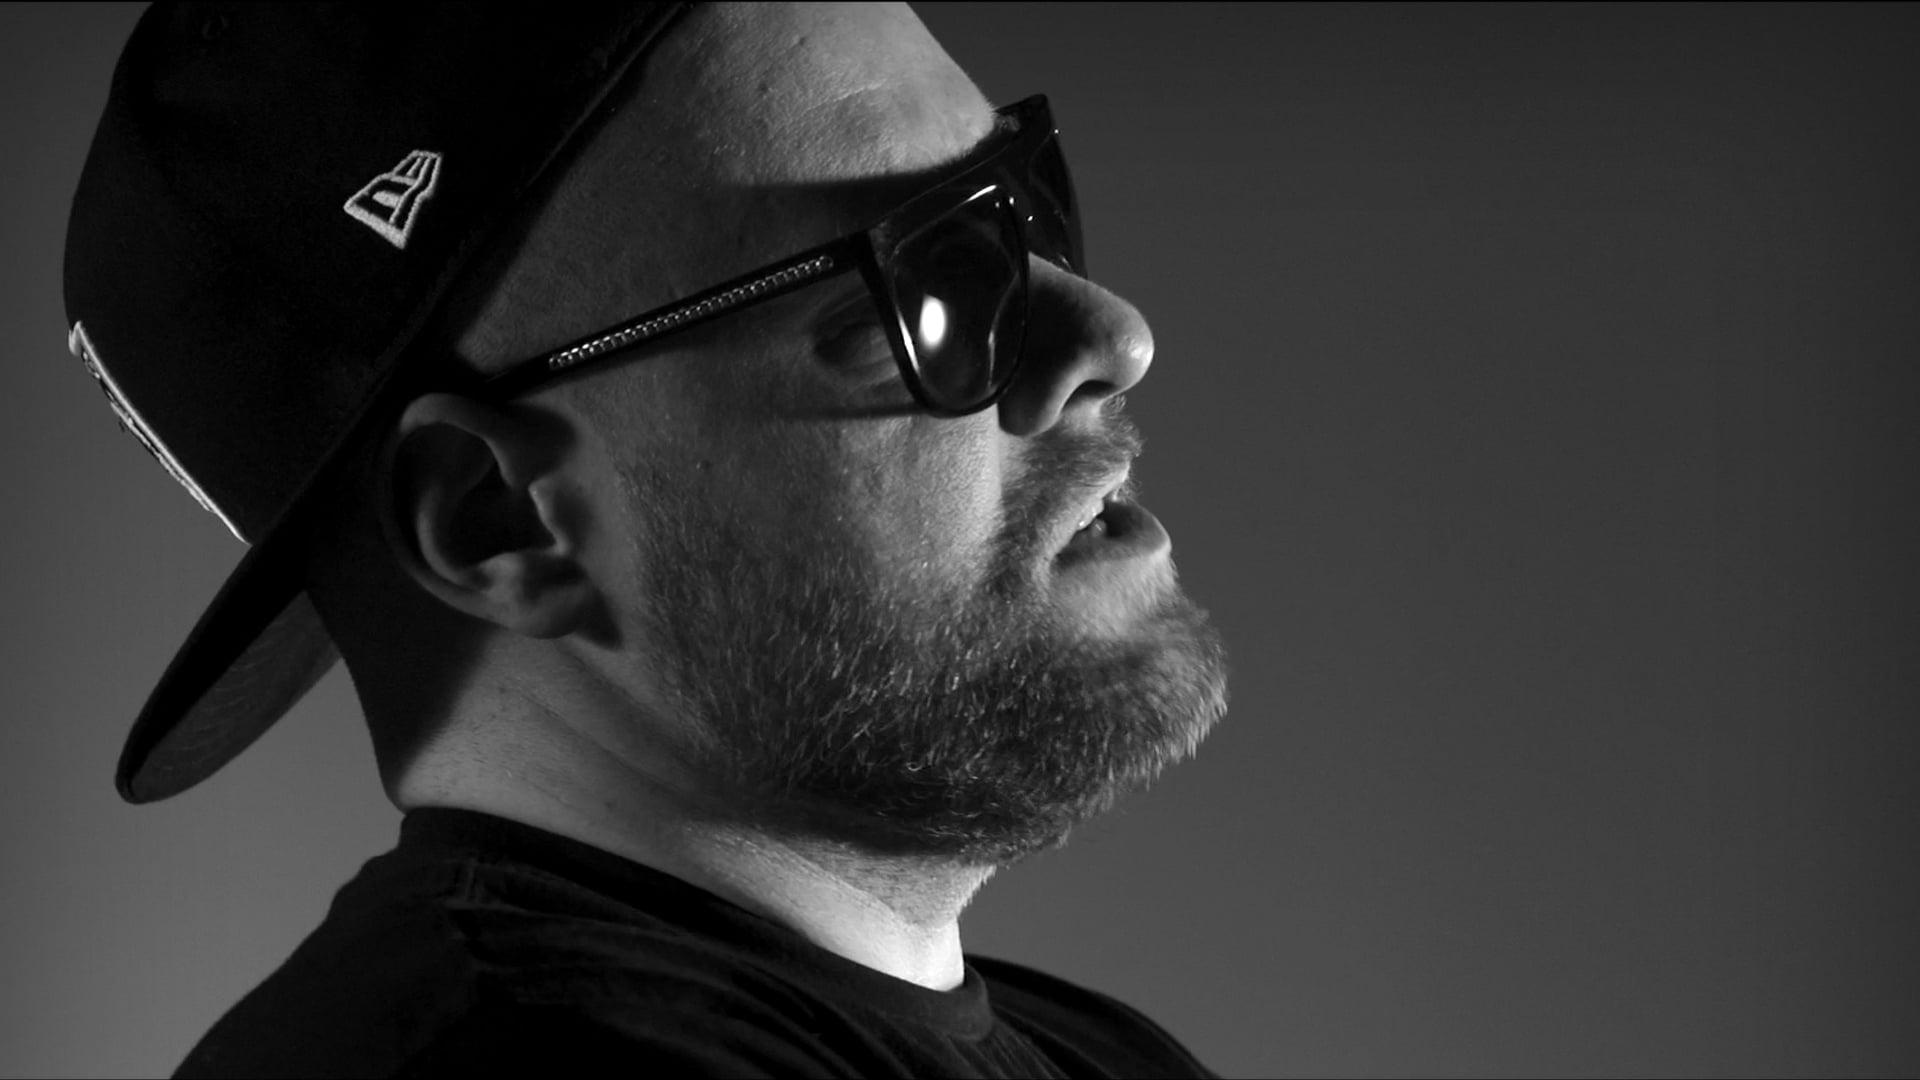 "Diox HIFI ft. Miuosh, Mosad, Małach, Vienio, PMM, Haju, Tede, Peerzet, Sir Michu ""Oni tego chcą (Remix)"""